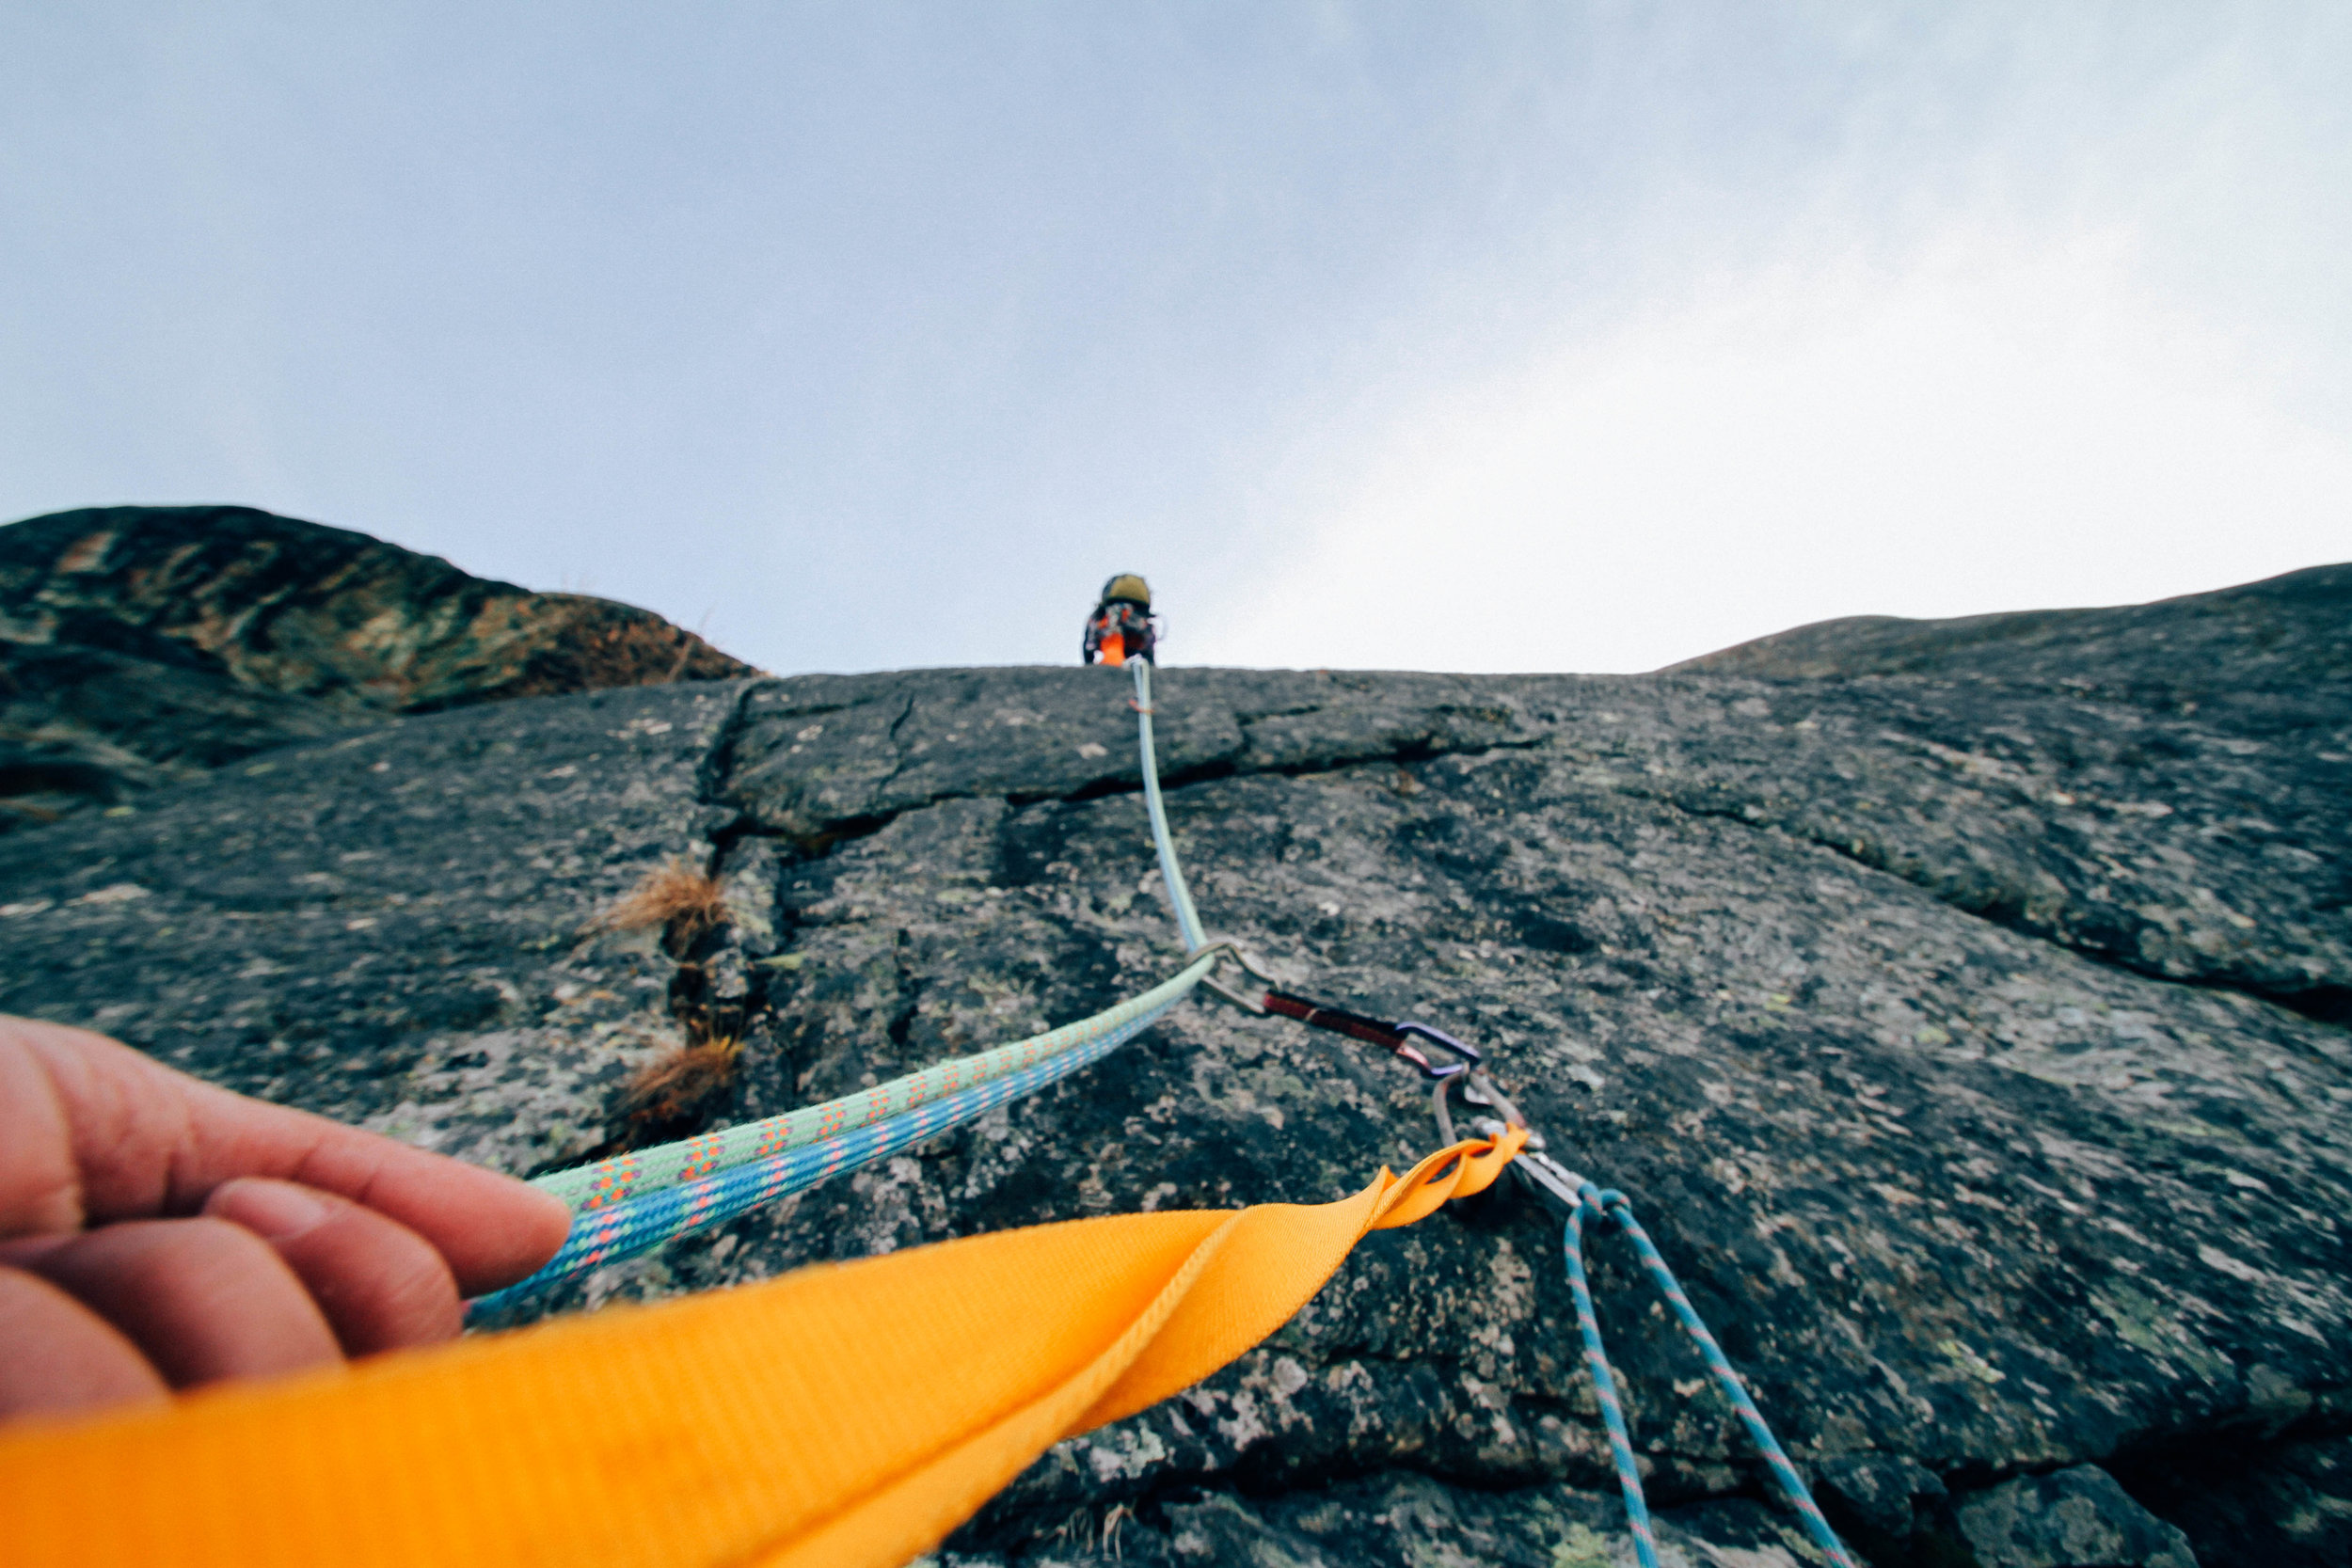 climbing-injury-prevention-treatment-strength-training